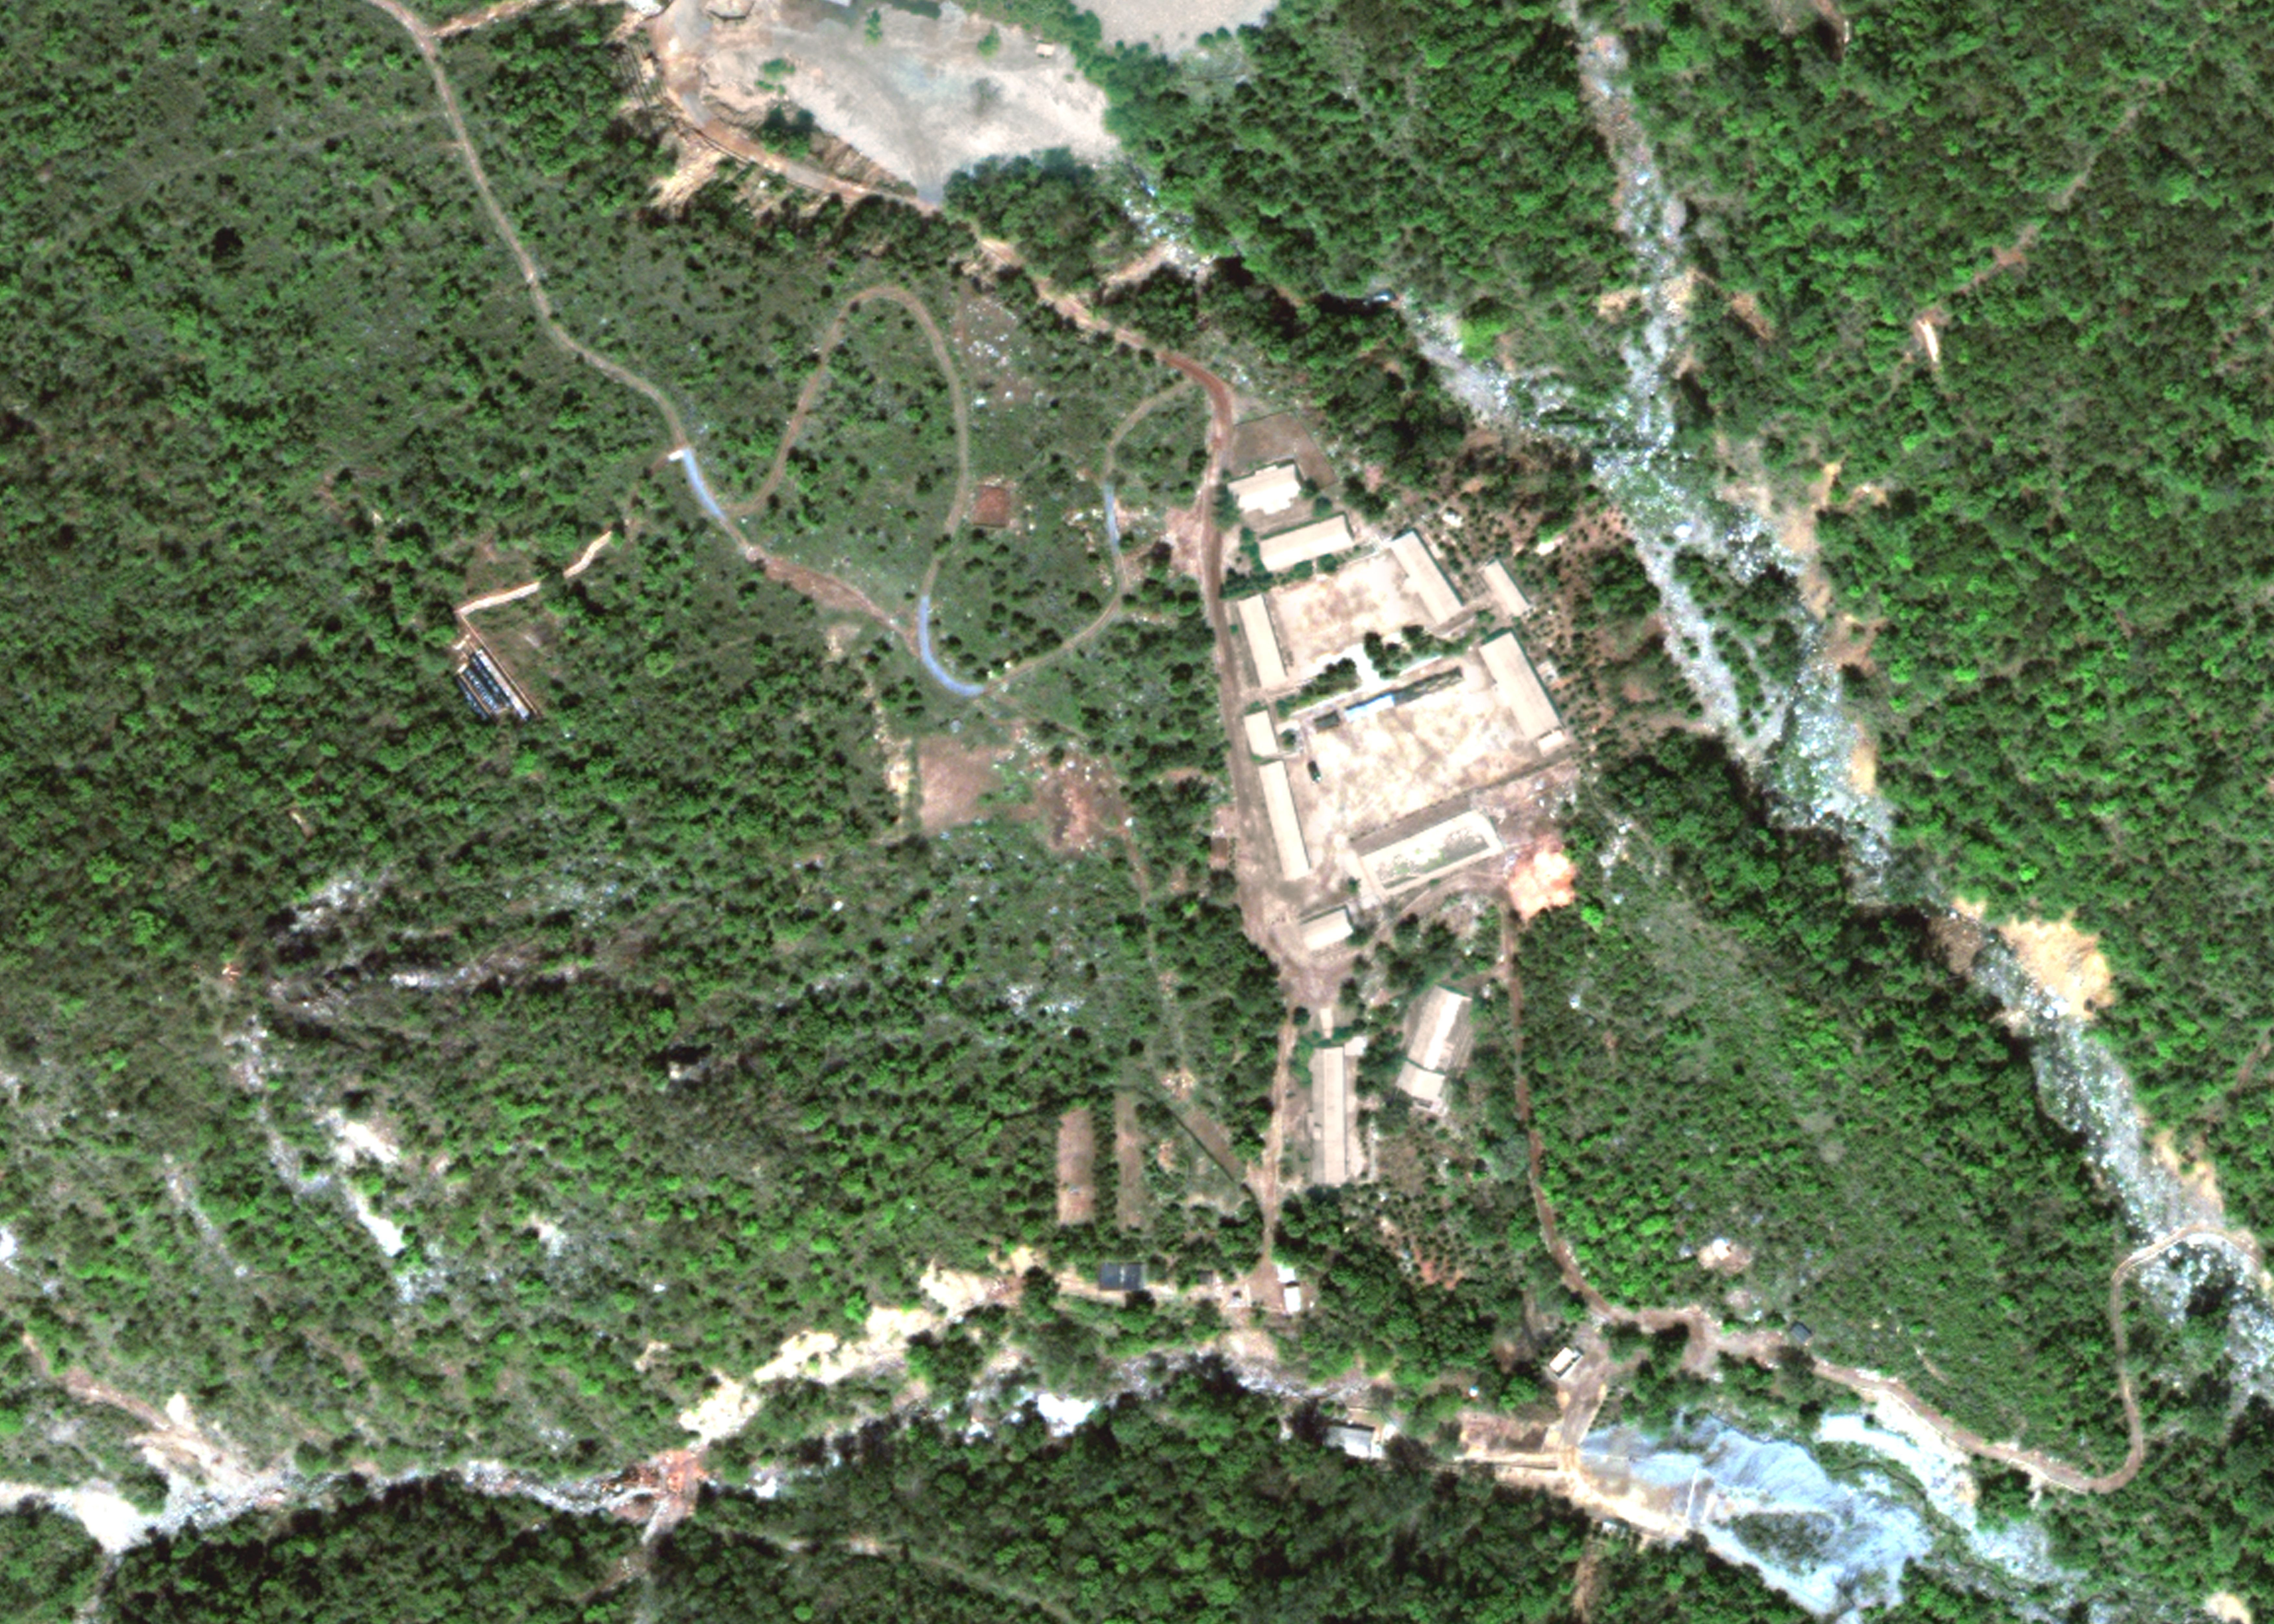 PUNGGYE-RI NUCLEAR TEST SITE, NORTH KOREA - MAY 23, 2018. DigitalGlobe satellite imagery of North Korea's Punggye-ri nuclear test site.  (Photo DigitalGlobe via Getty Images)